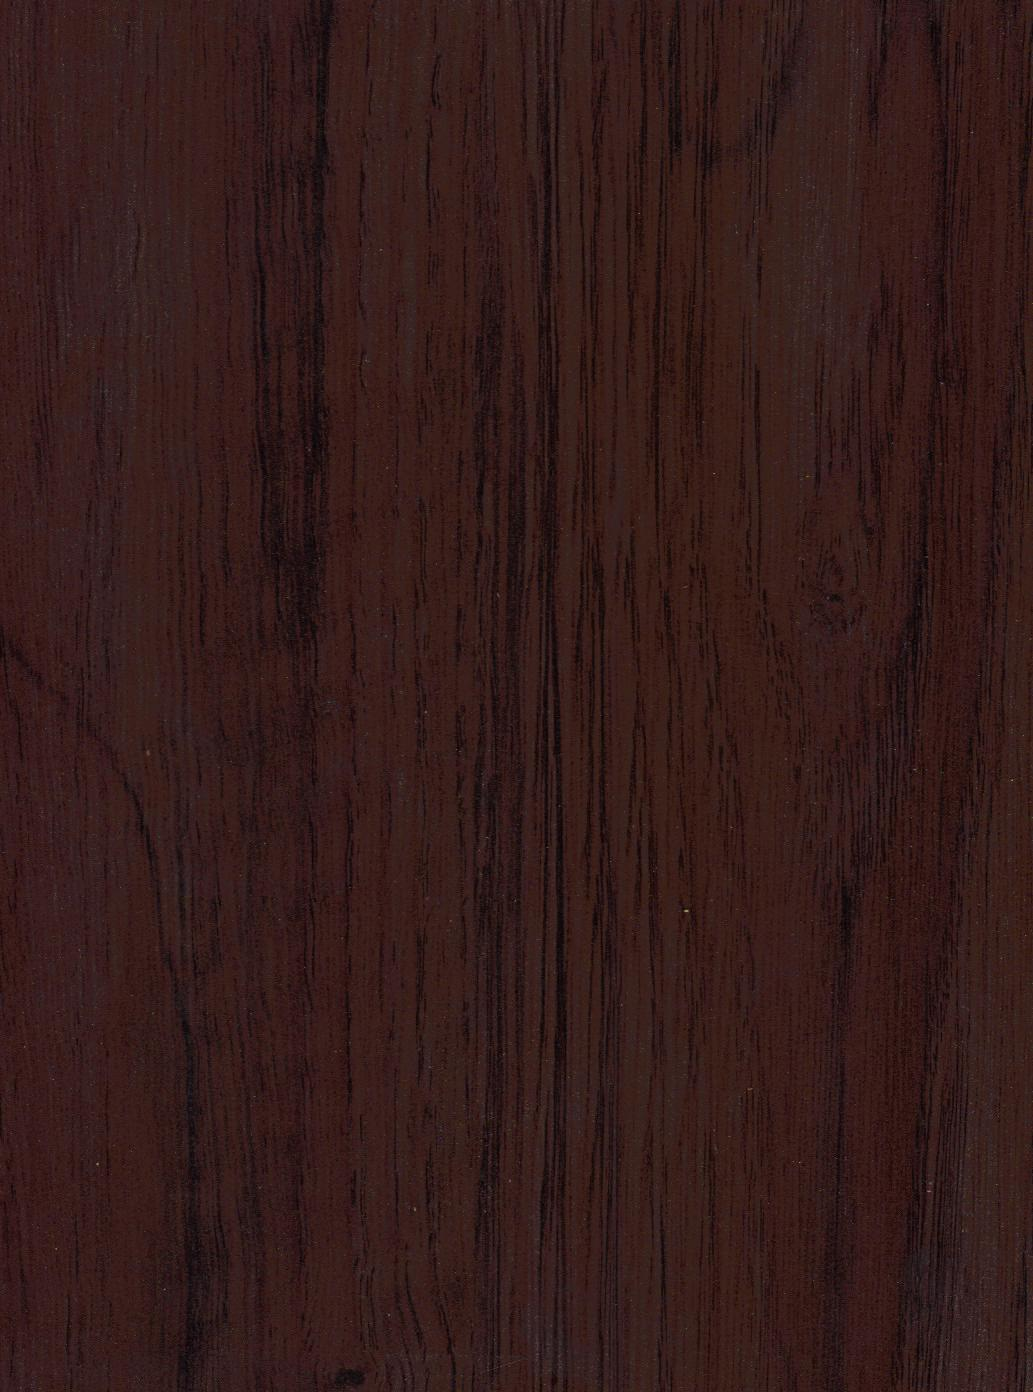 American Walnut Laminate Flooring